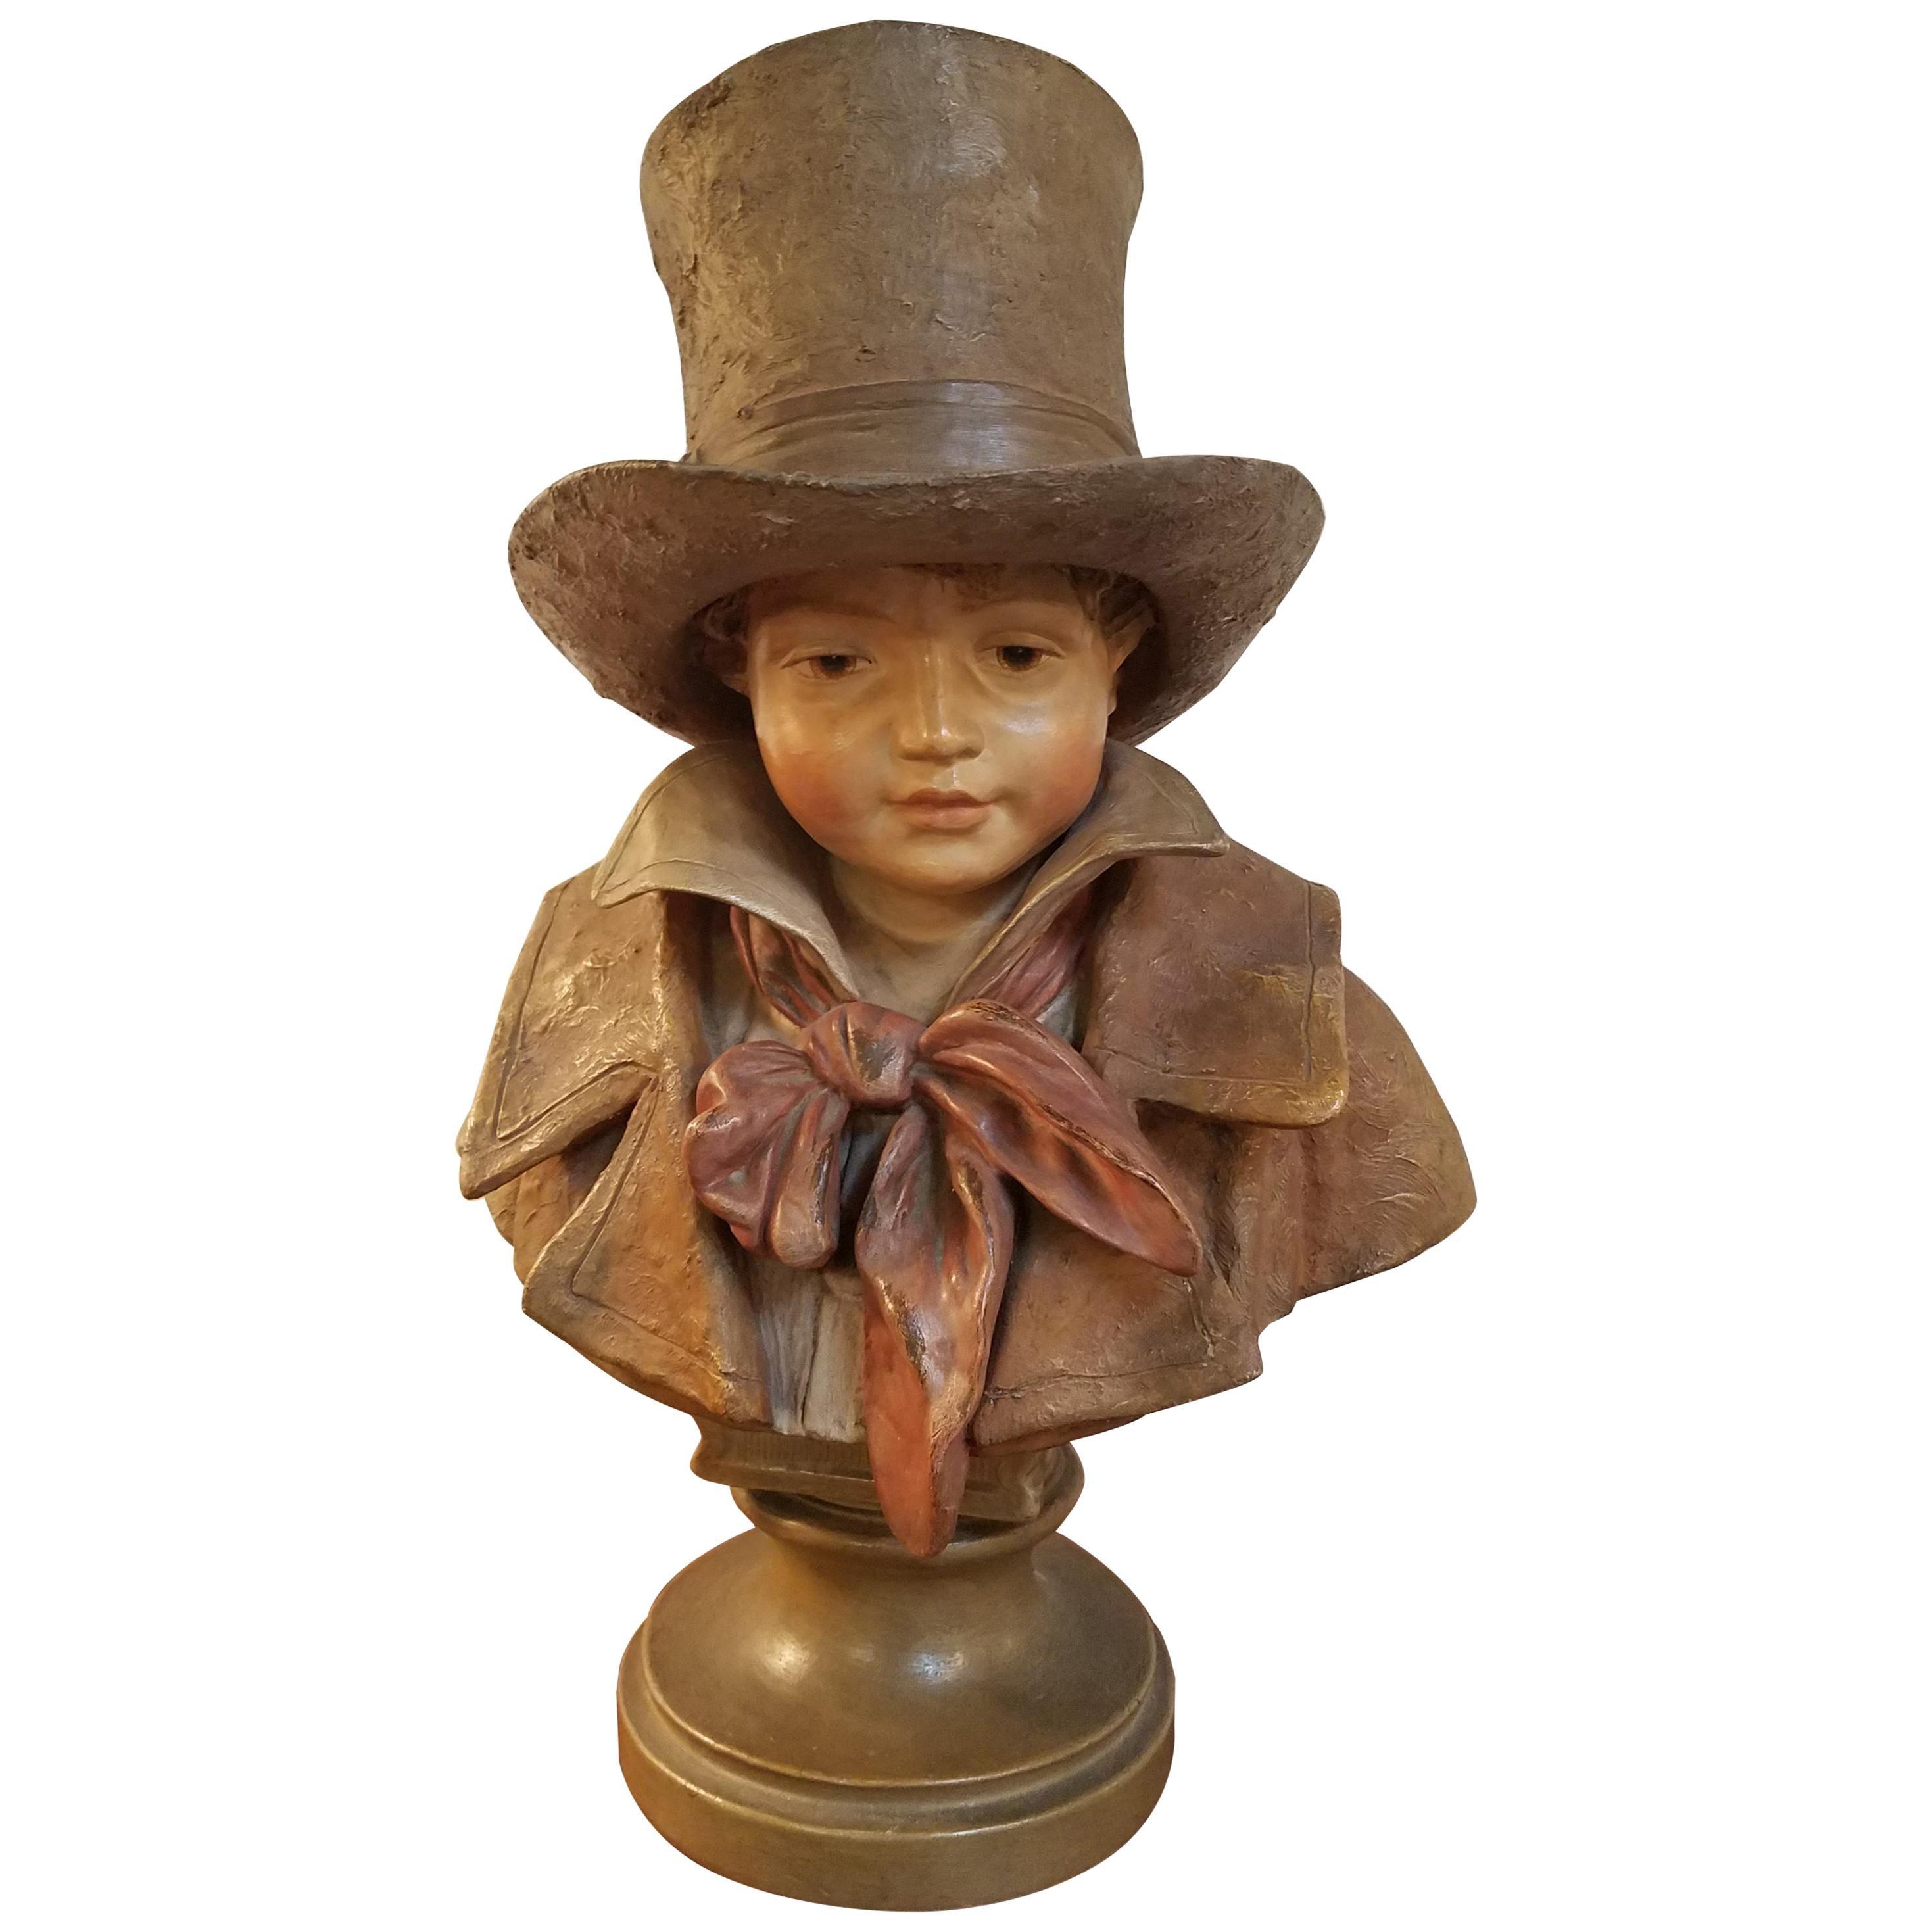 Charming 19th Century English Terracotta Bust